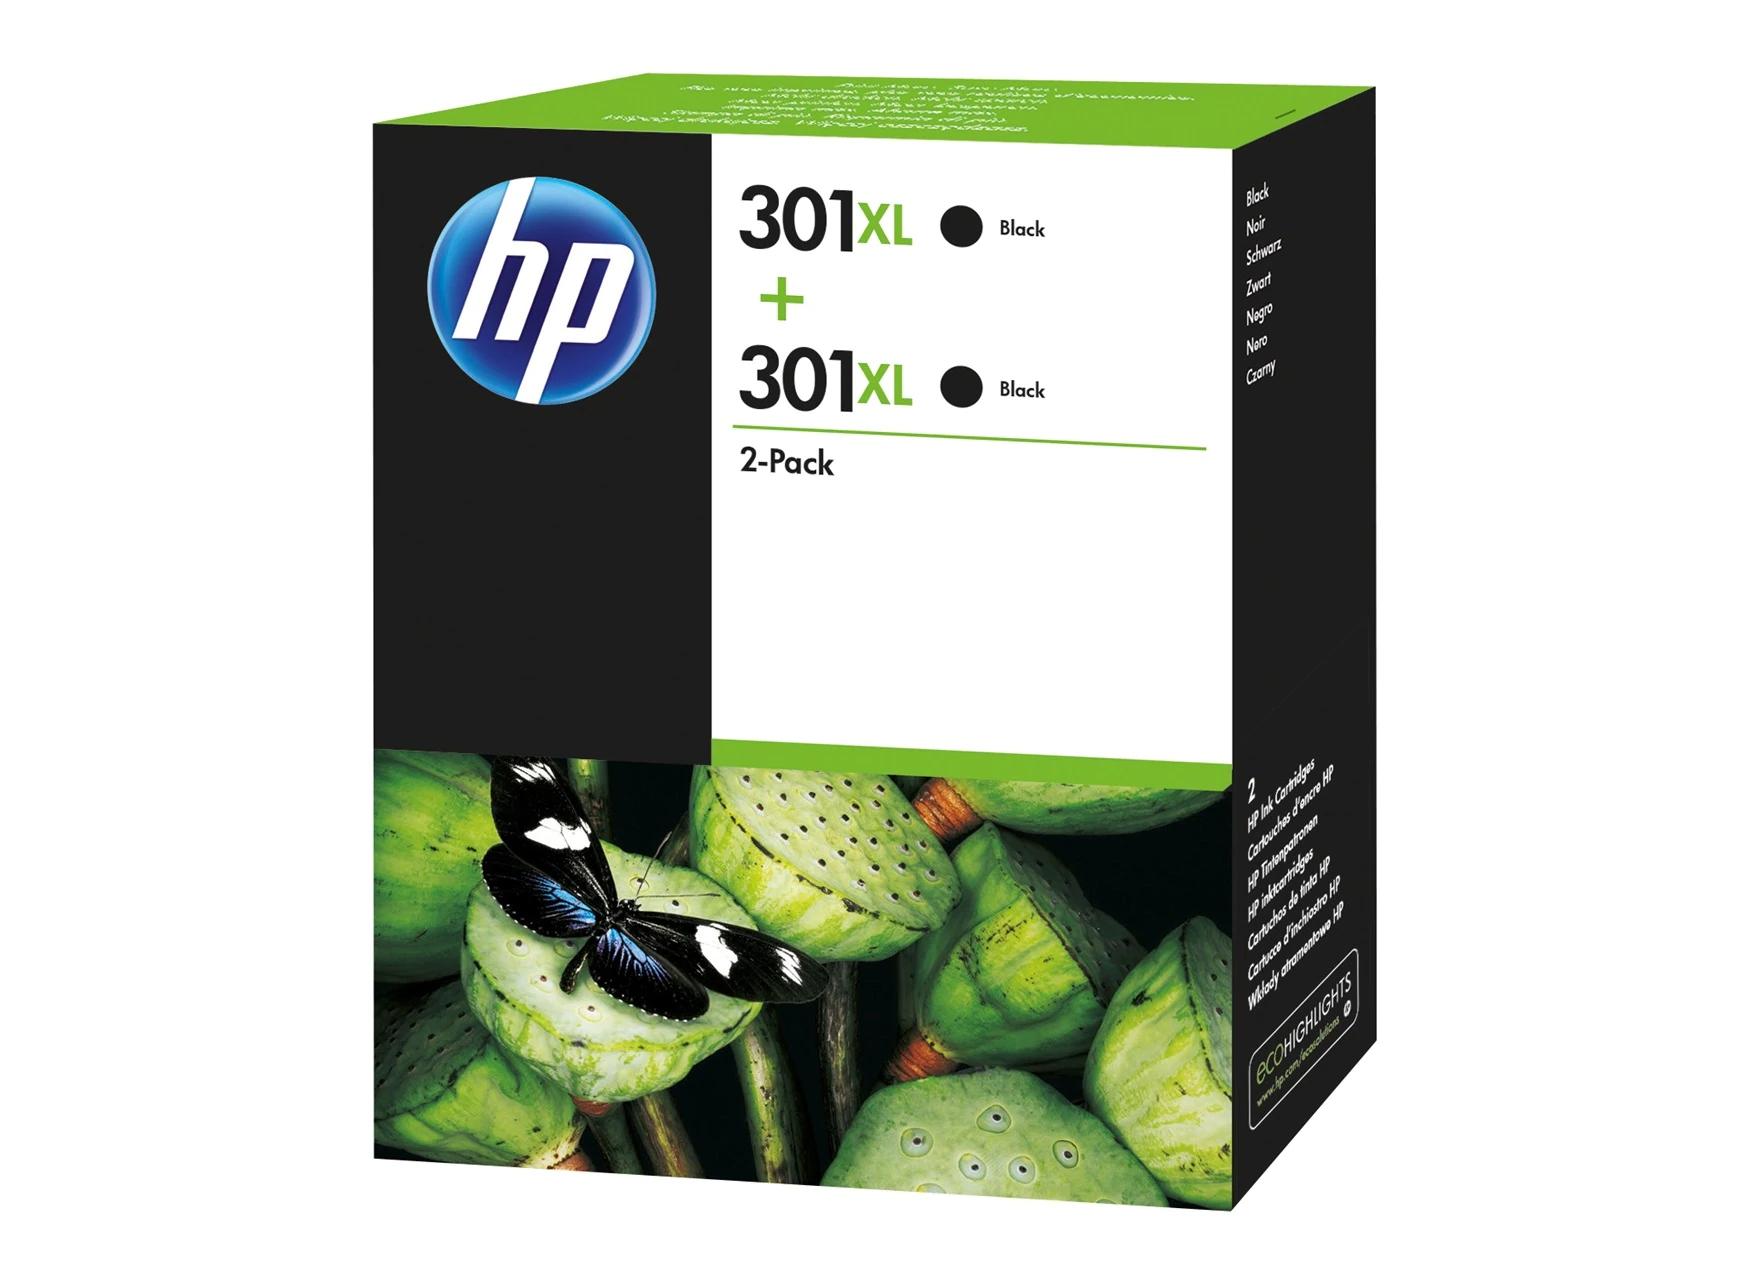 HP 301XL High Yield Ink Cartridge Twin Pack D8J45AE, Black £43.67 @ Staples UK